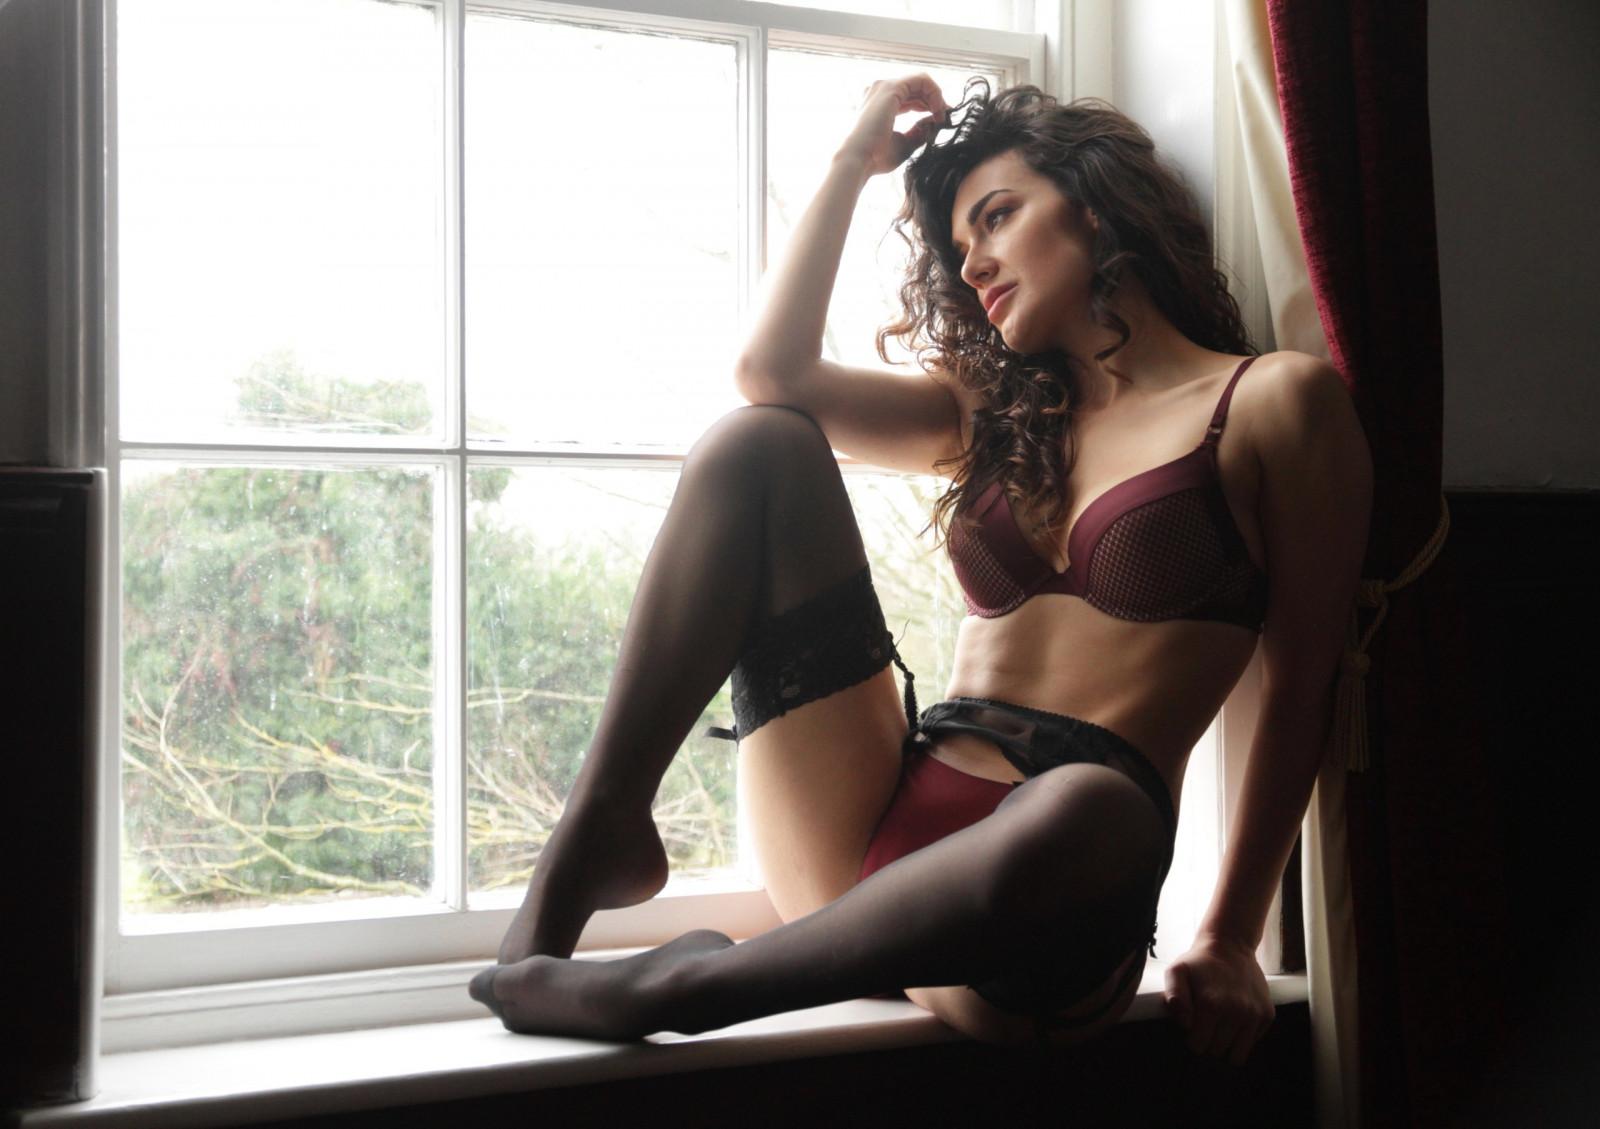 Wallpaper  Women, Window, Long Hair, Sitting, Stockings -3196